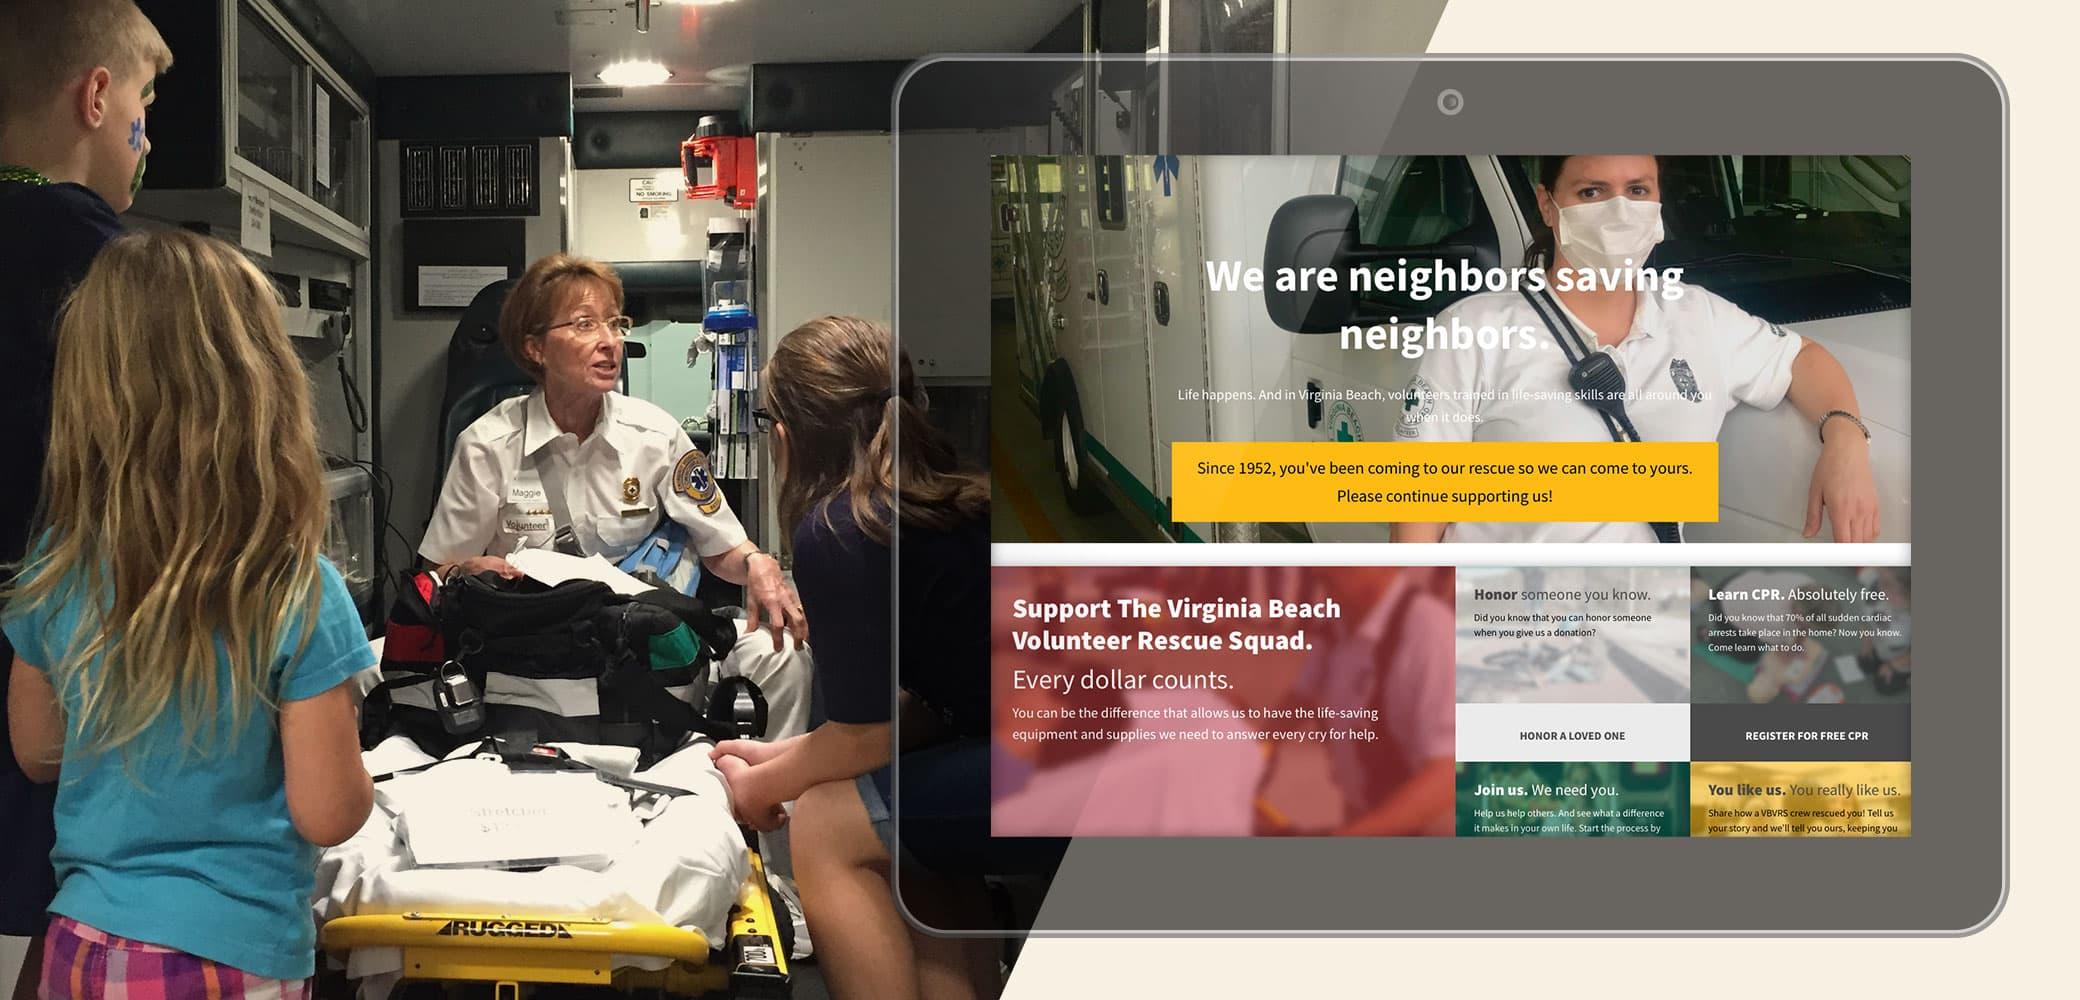 Virginia Beach Volunteer Rescue Squad Website Strategy, Design & Development by Red Chalk Studios